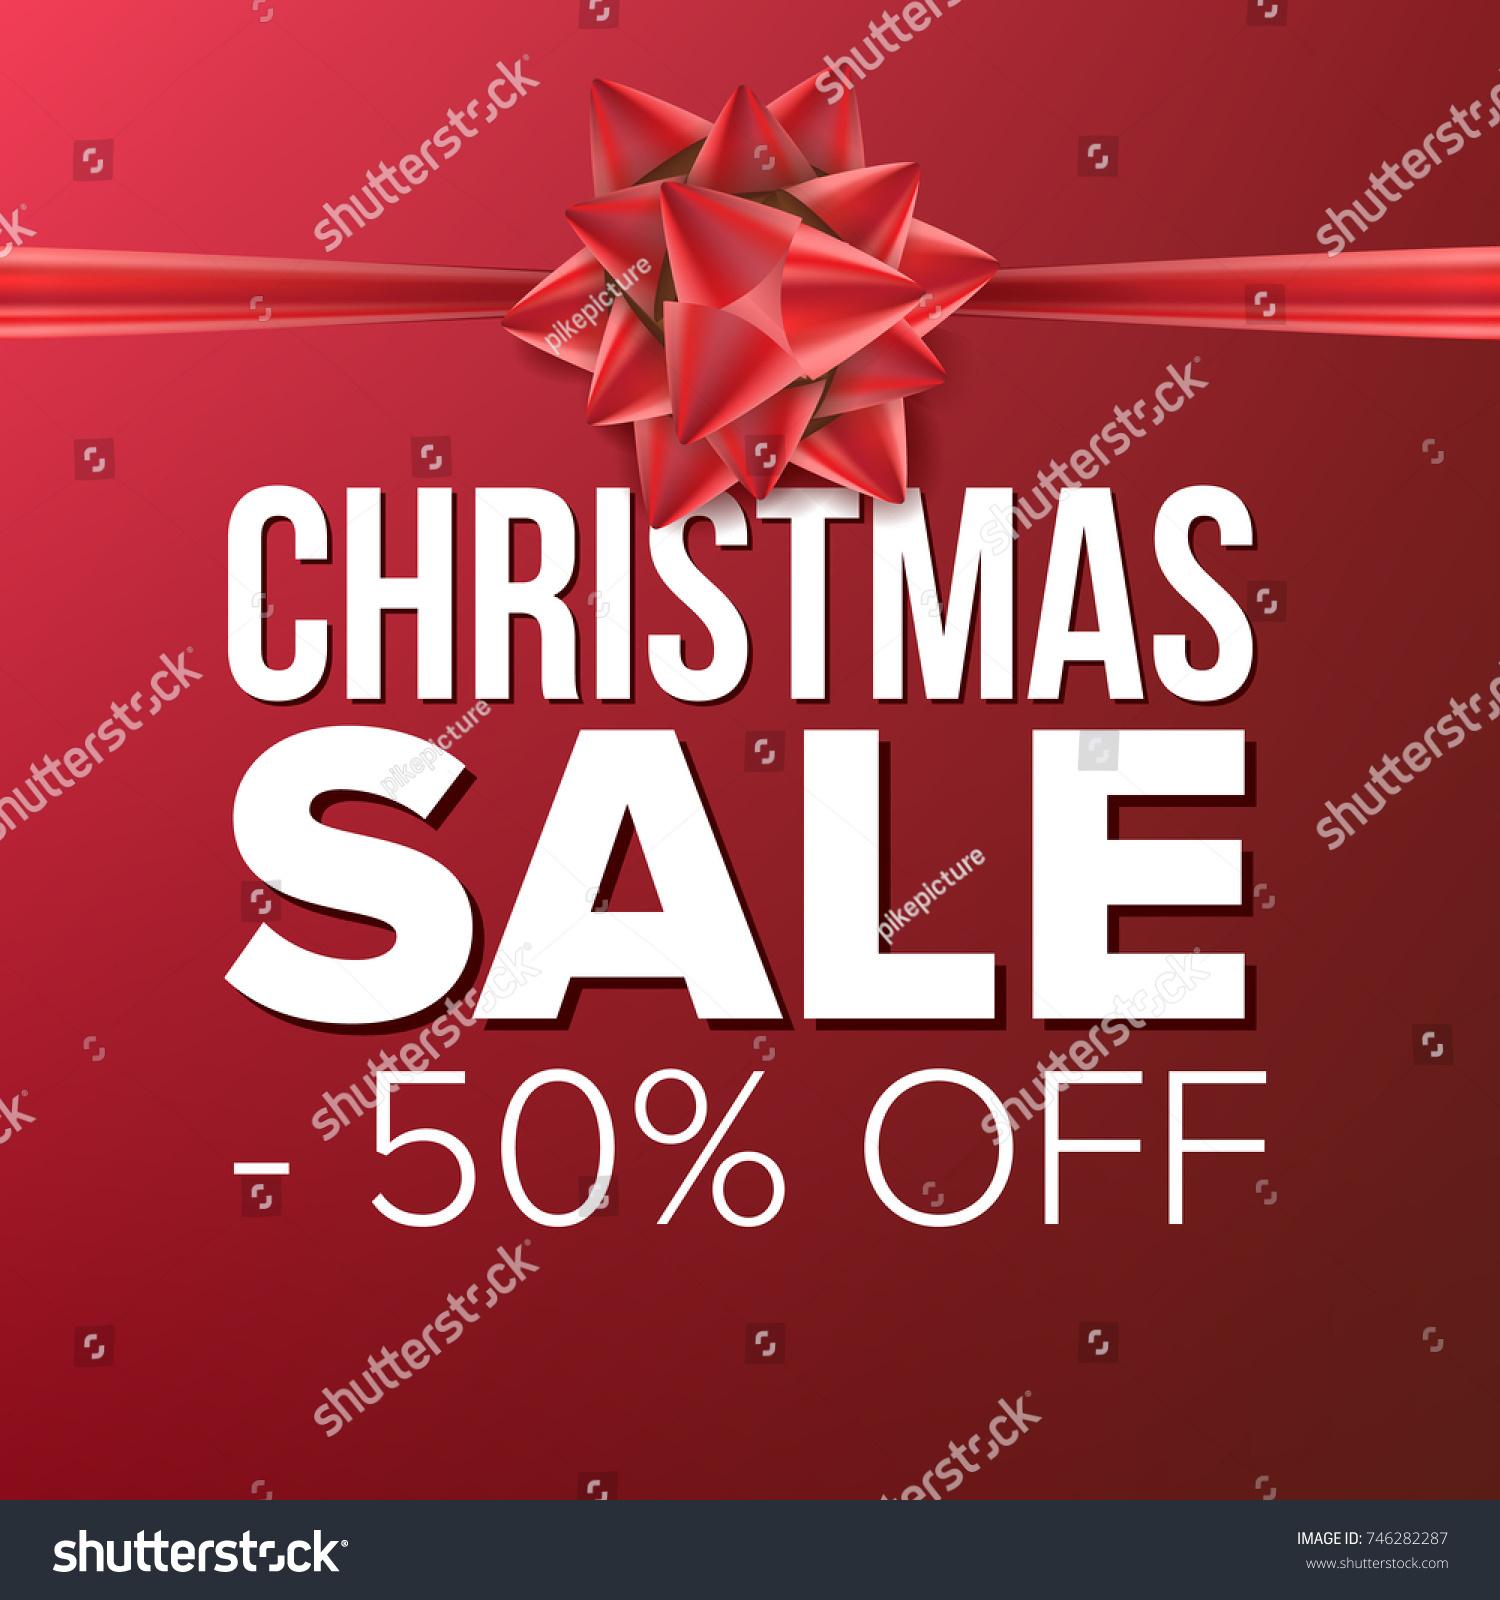 Christmas sale banner vector december holidays stock for Cheap designer wallpaper sale